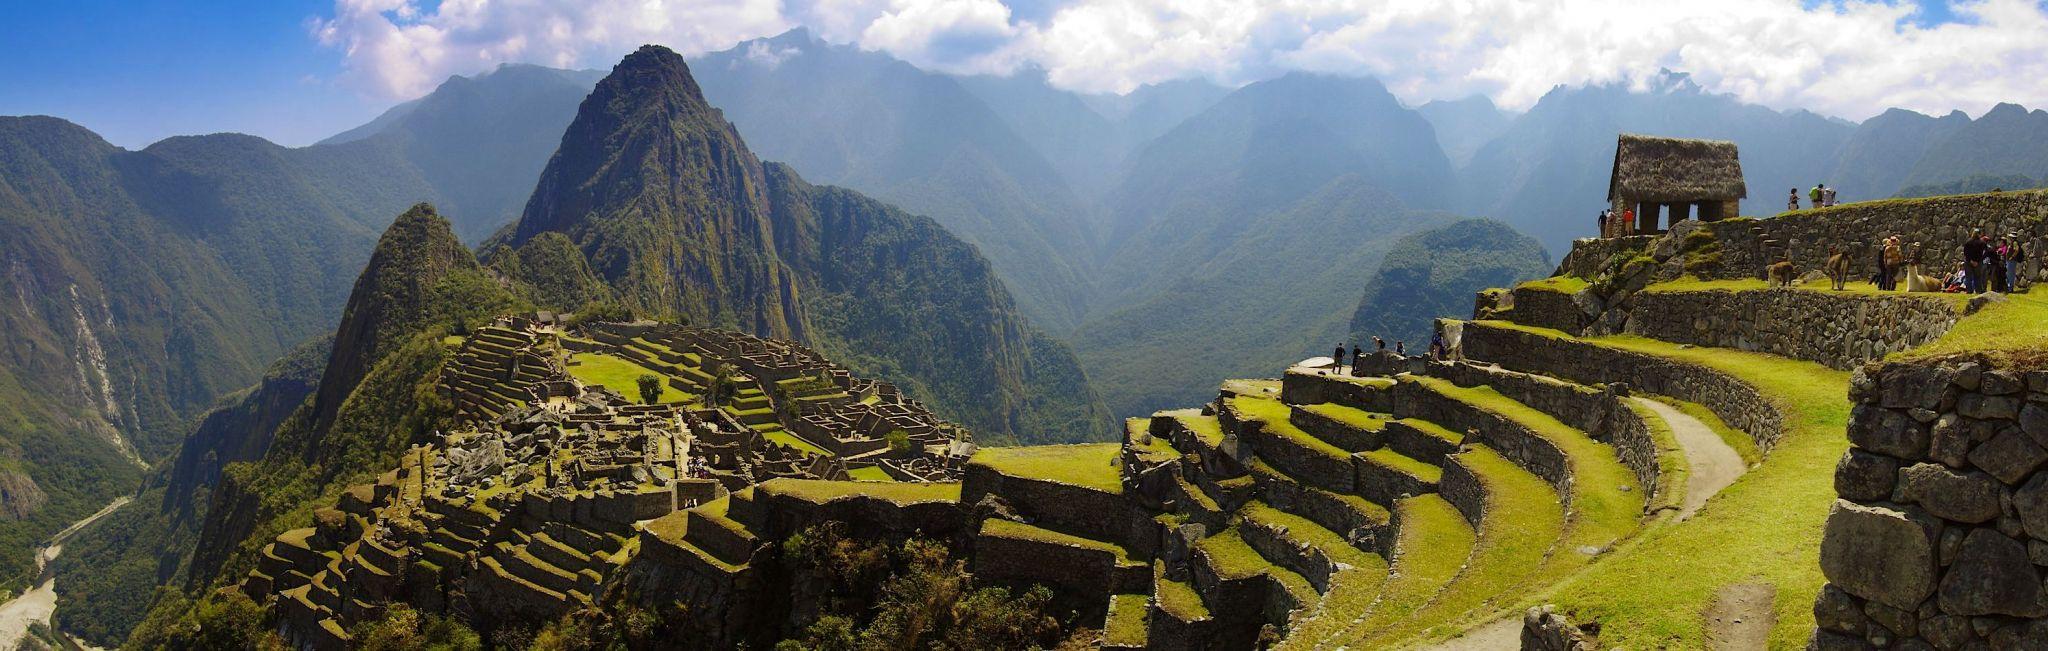 Machu Picchu Galapagos Land Tours